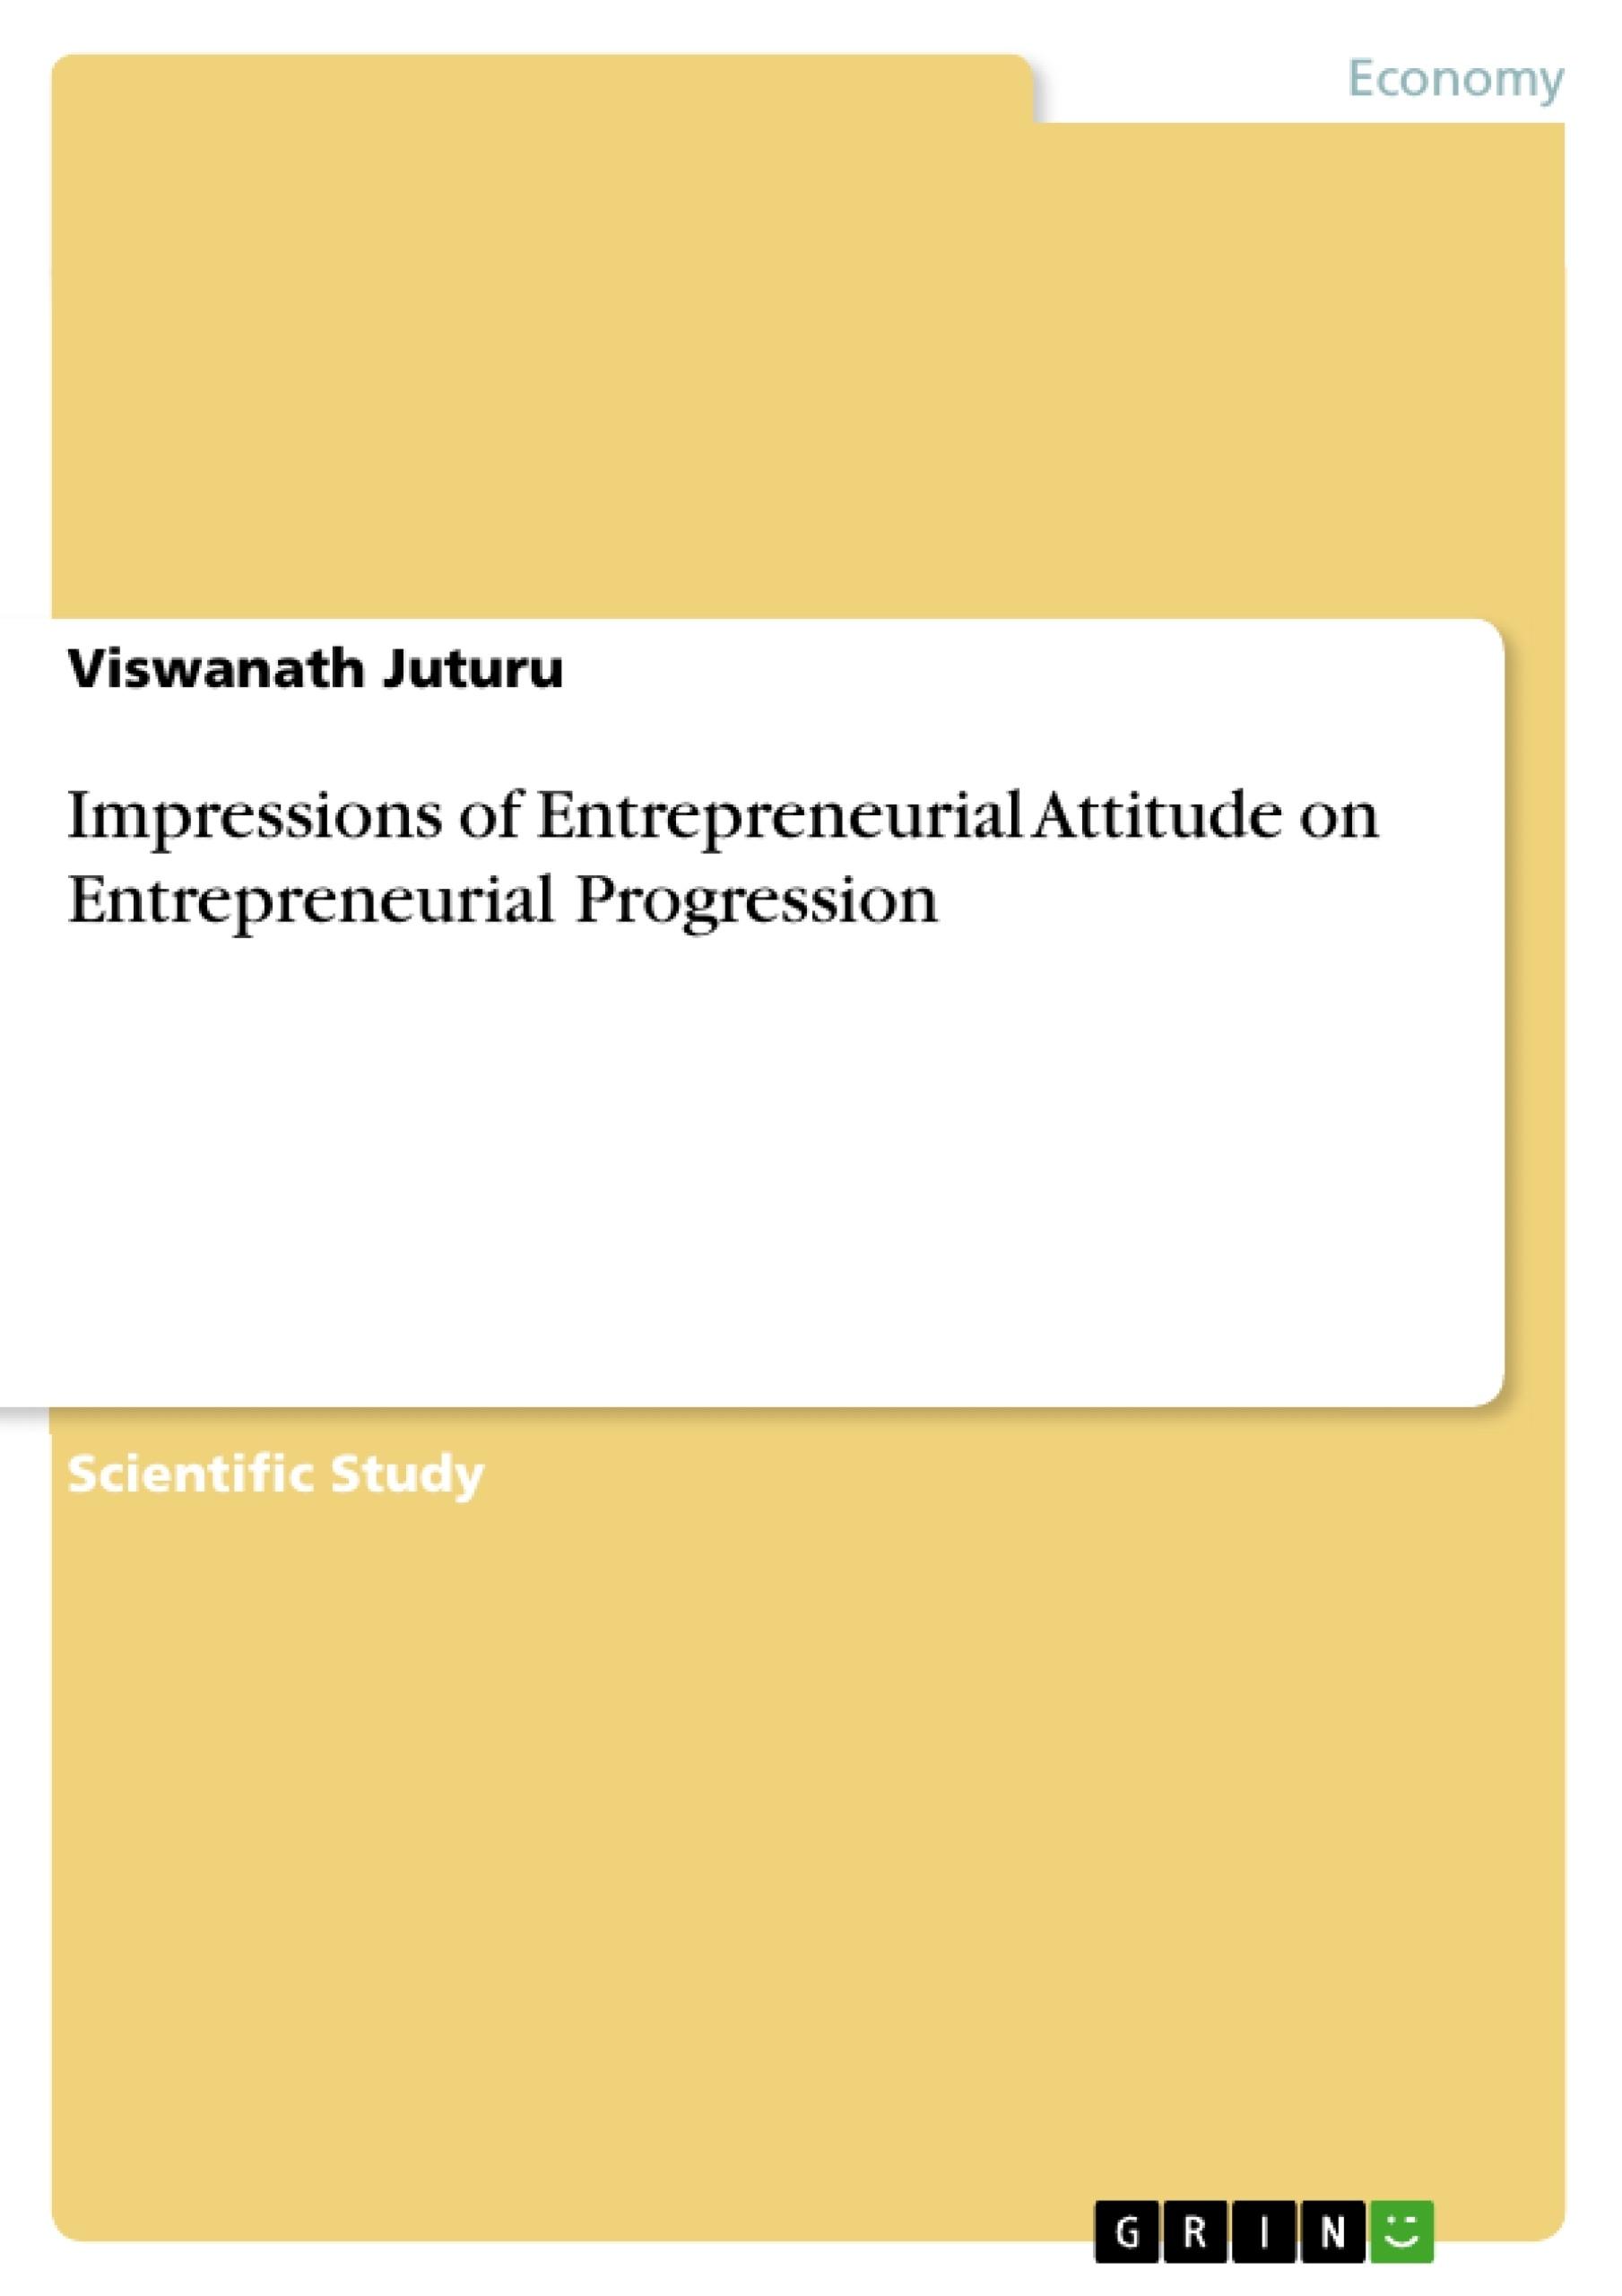 Title: Impressions of Entrepreneurial Attitude on Entrepreneurial Progression